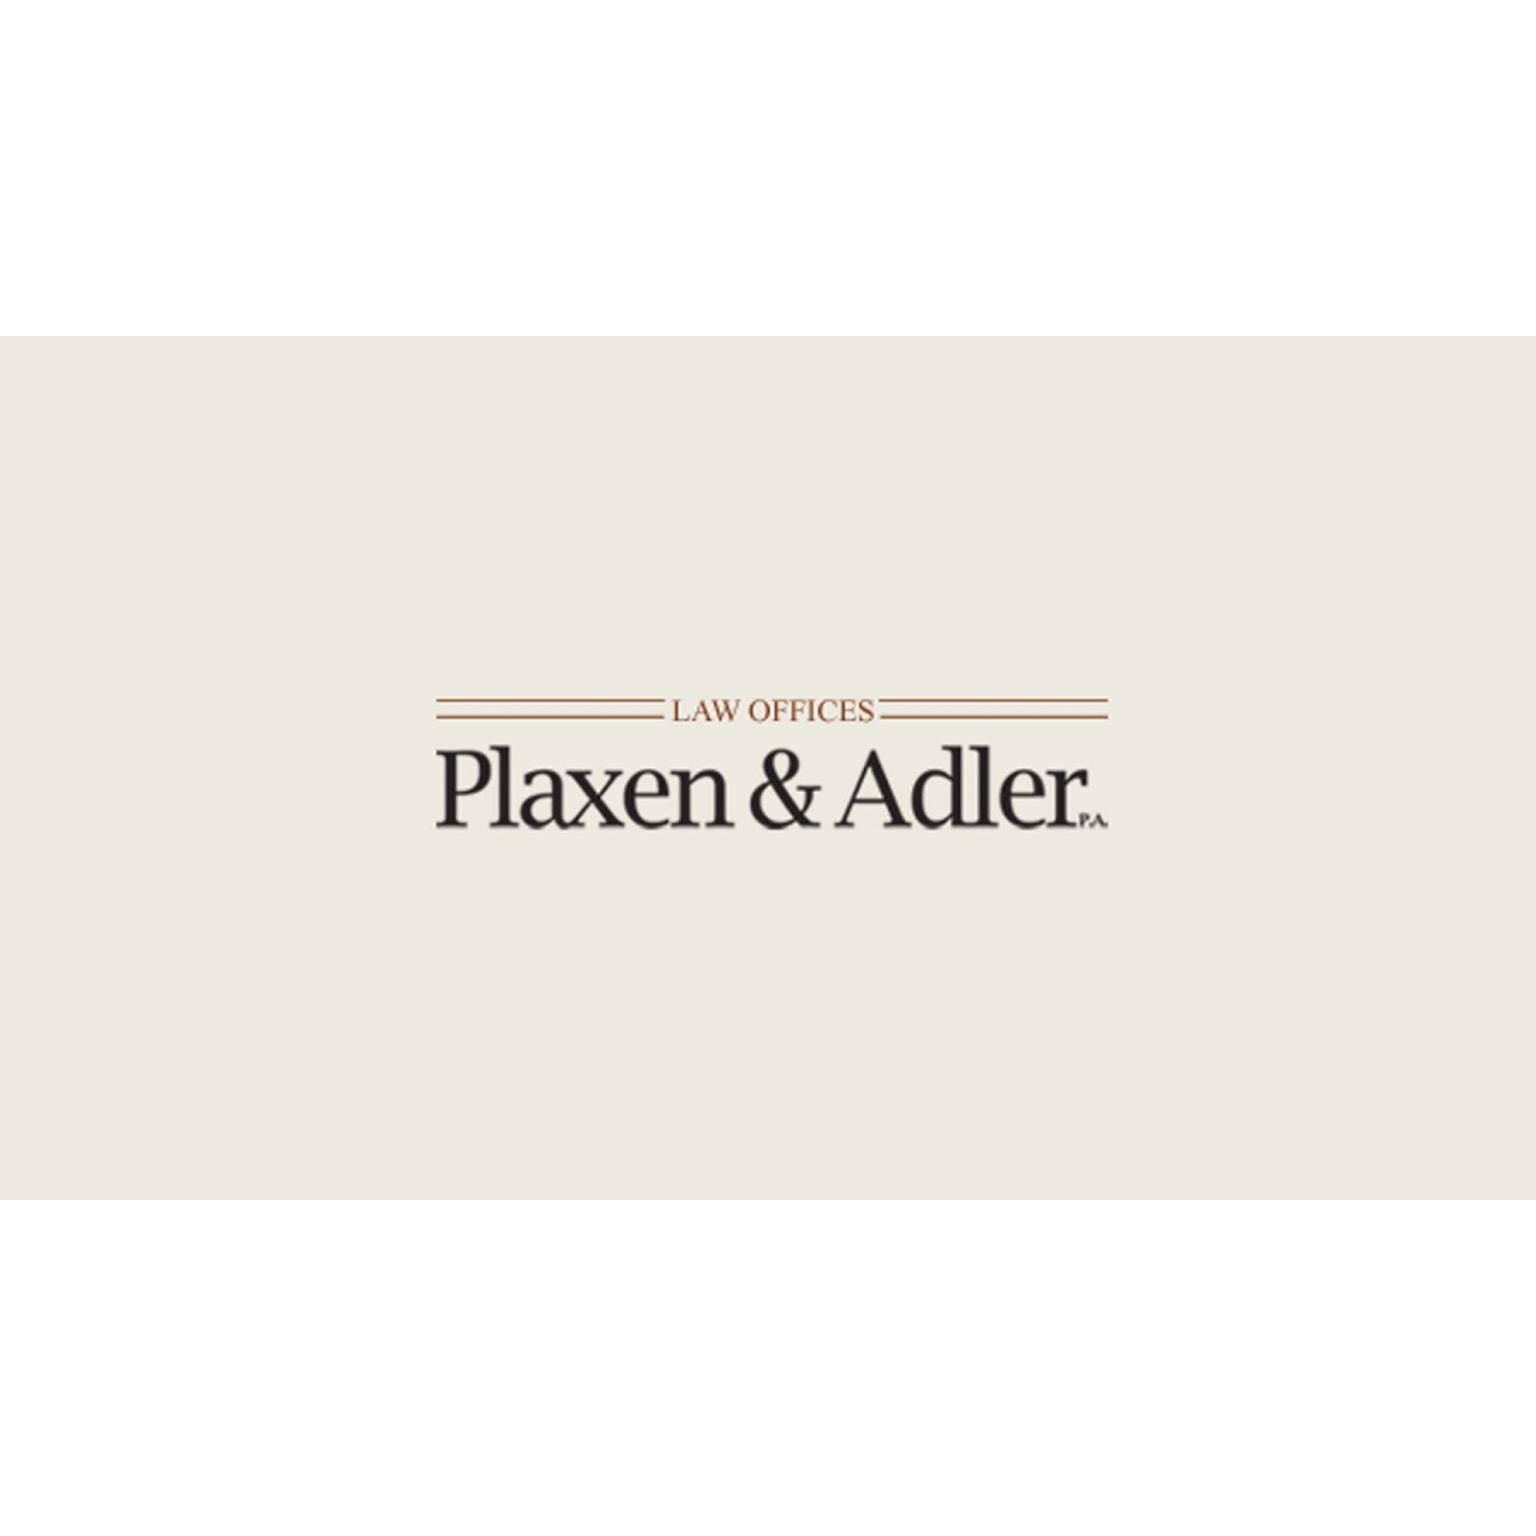 Plaxen & Adler, P.A. - ad image